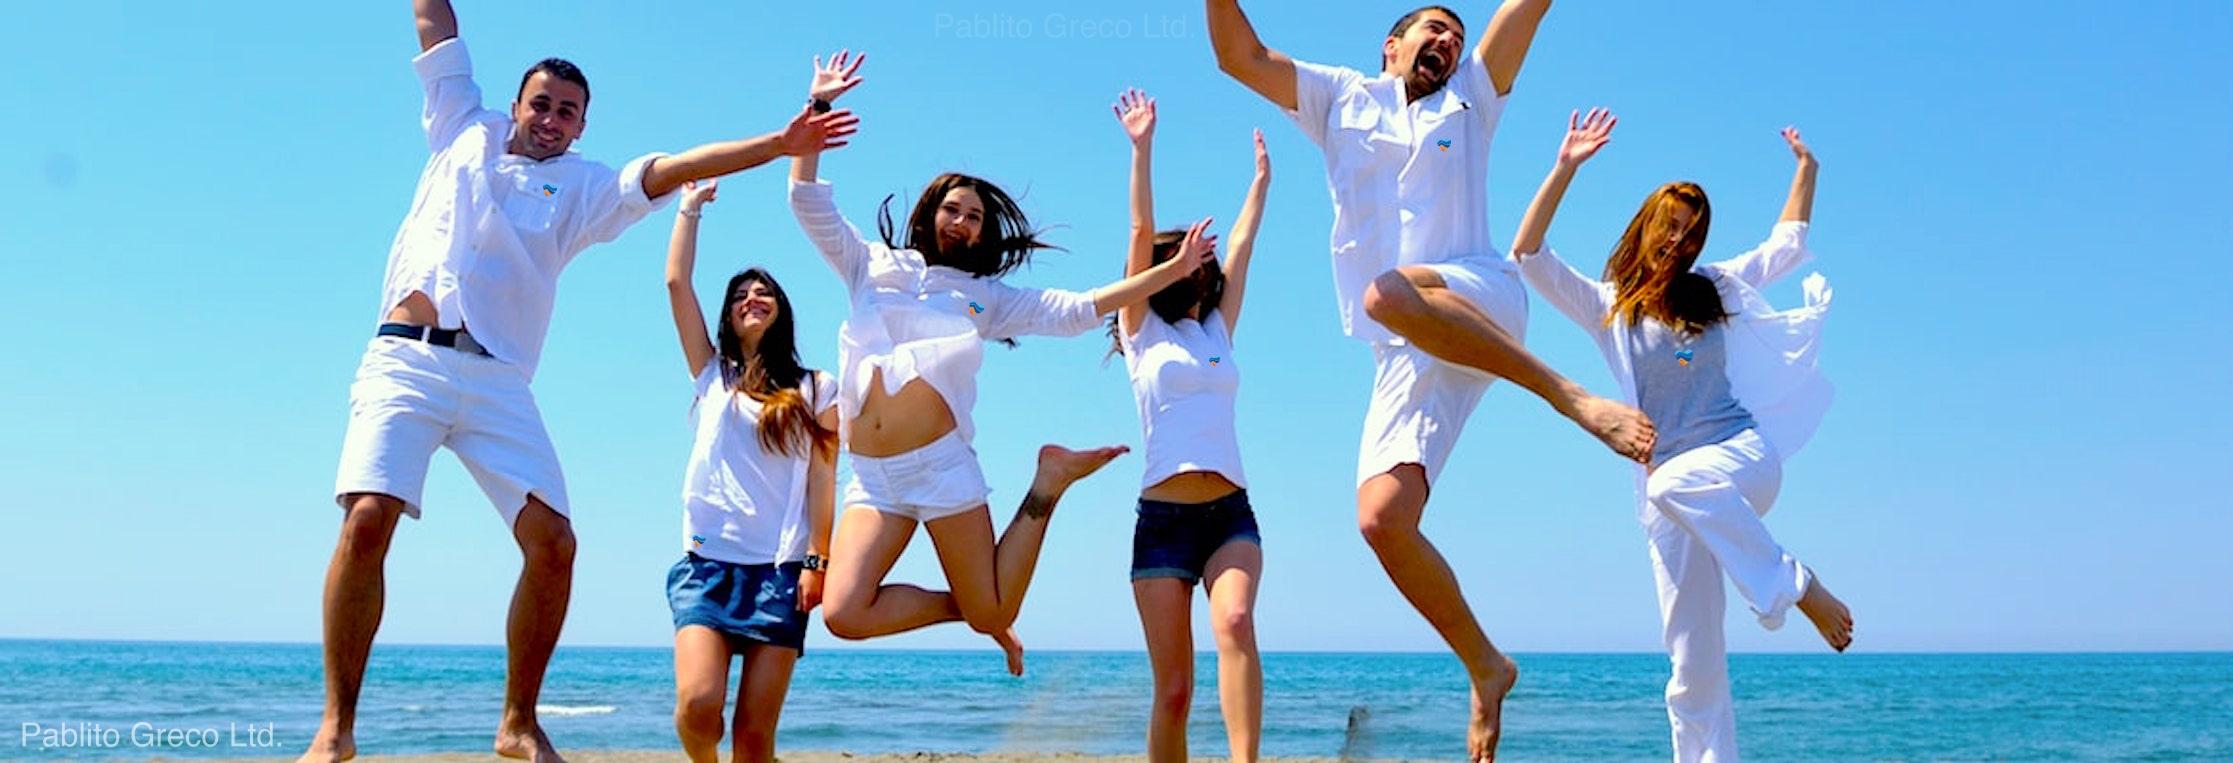 Summer Tango Experience participants on Halkidiki beach